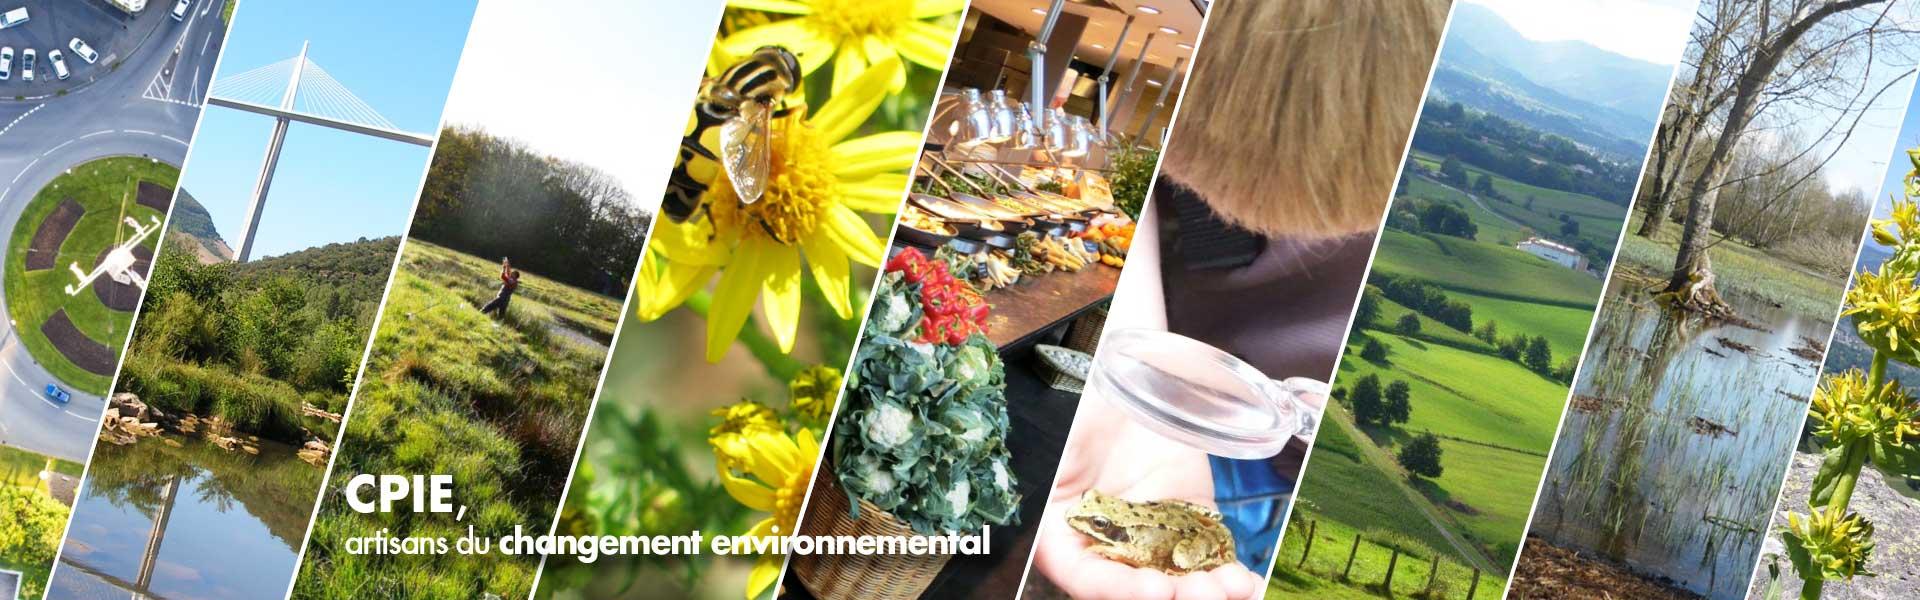 Artisans du changement environnemental